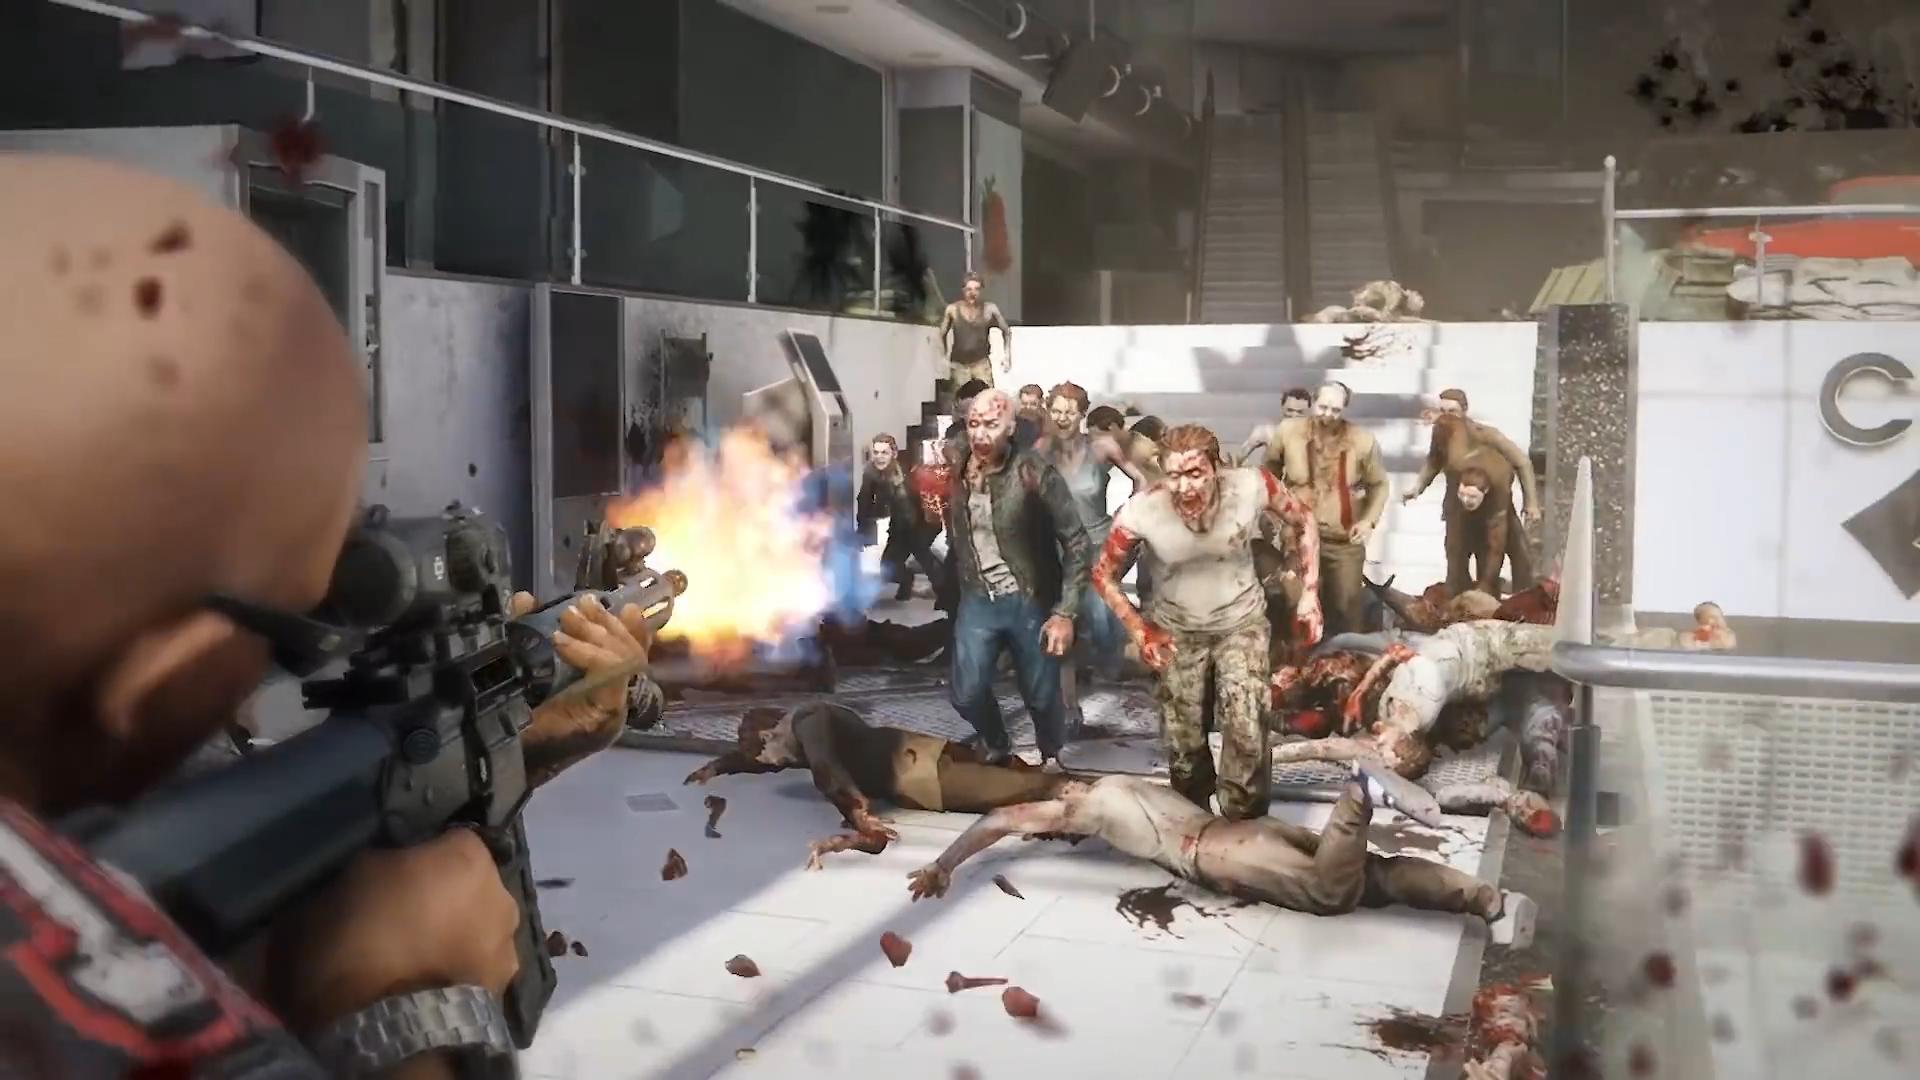 末日之戰Z, World War Z, WWZ, PS4, Xbox One, GSE,